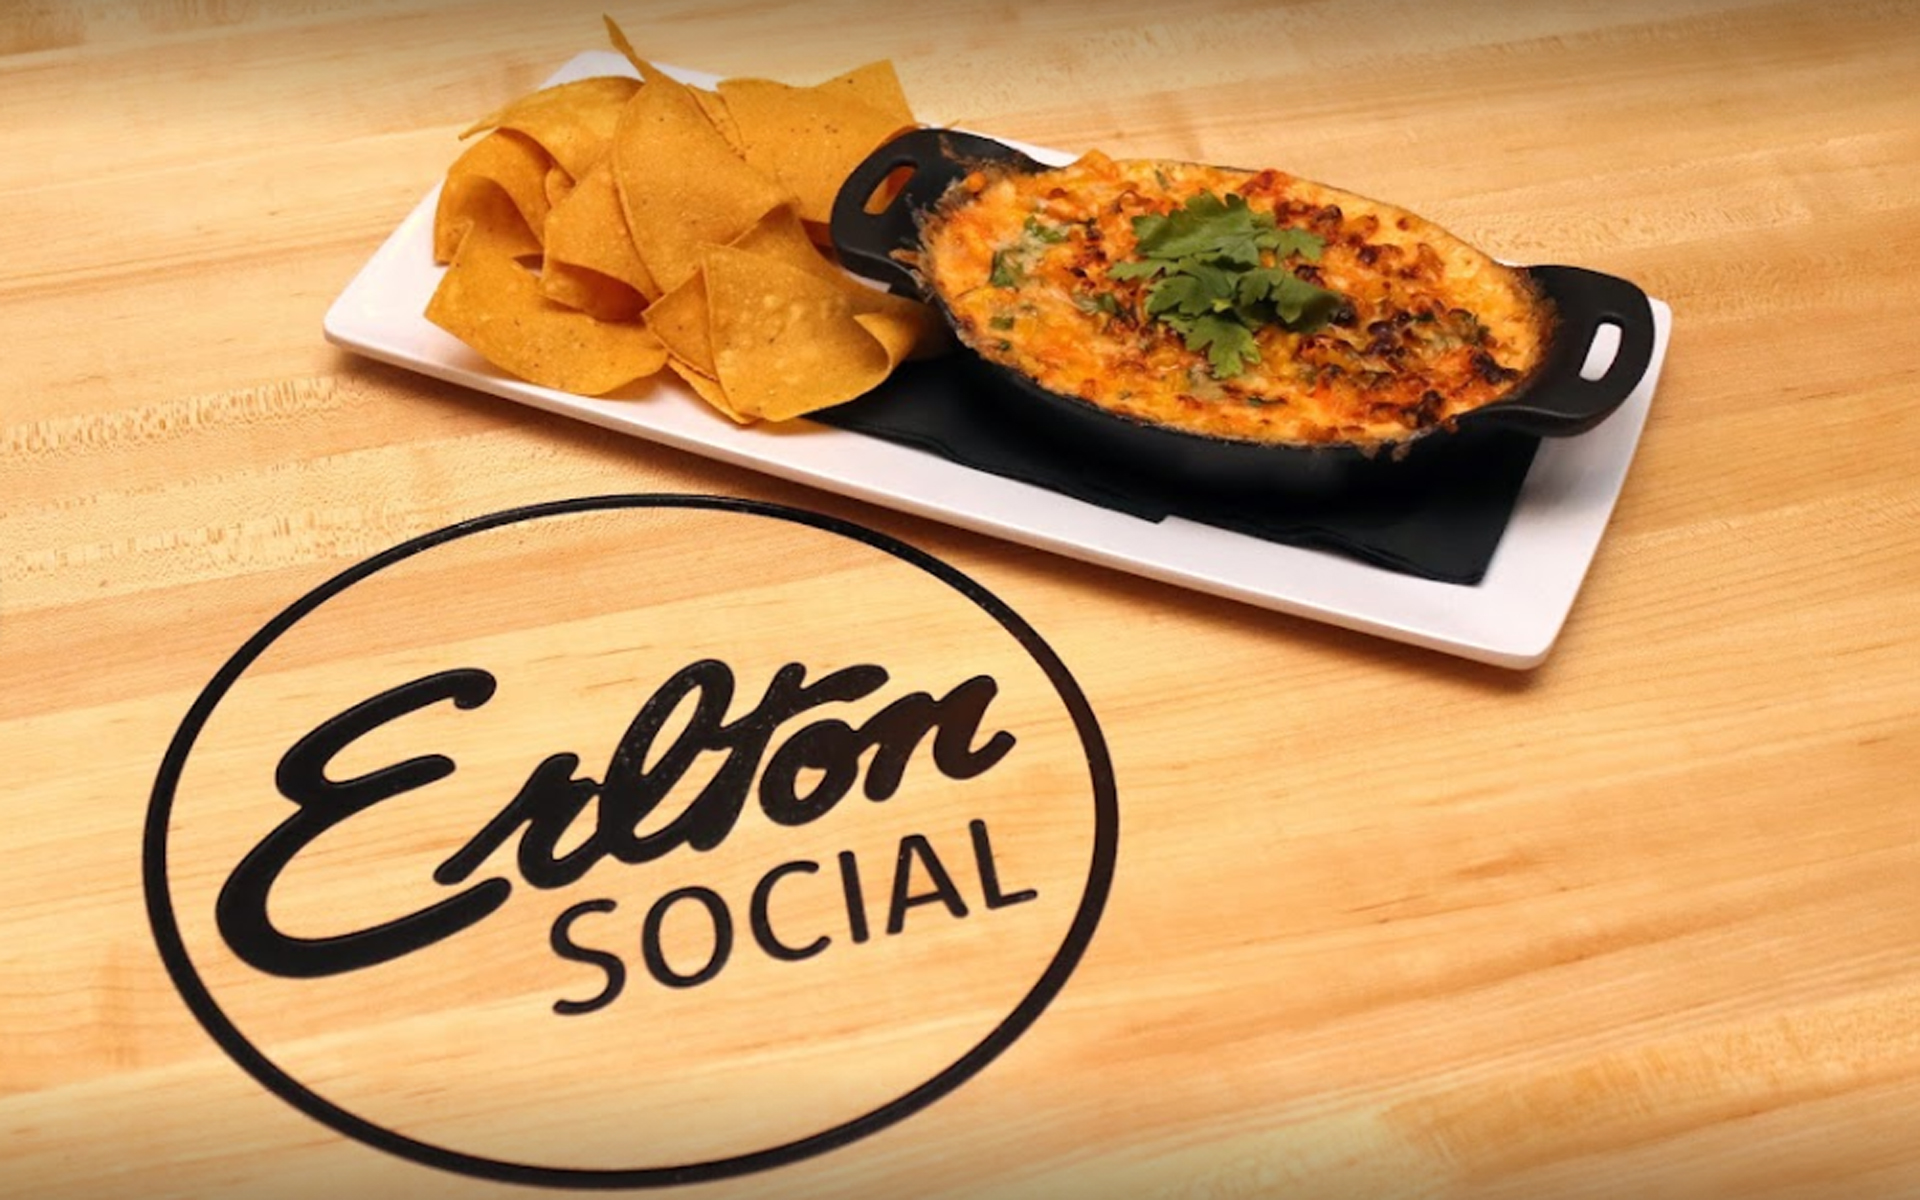 Erlton Social Craft Bar & Kitchen in Cherry Hill, NJ at Restaurant.com